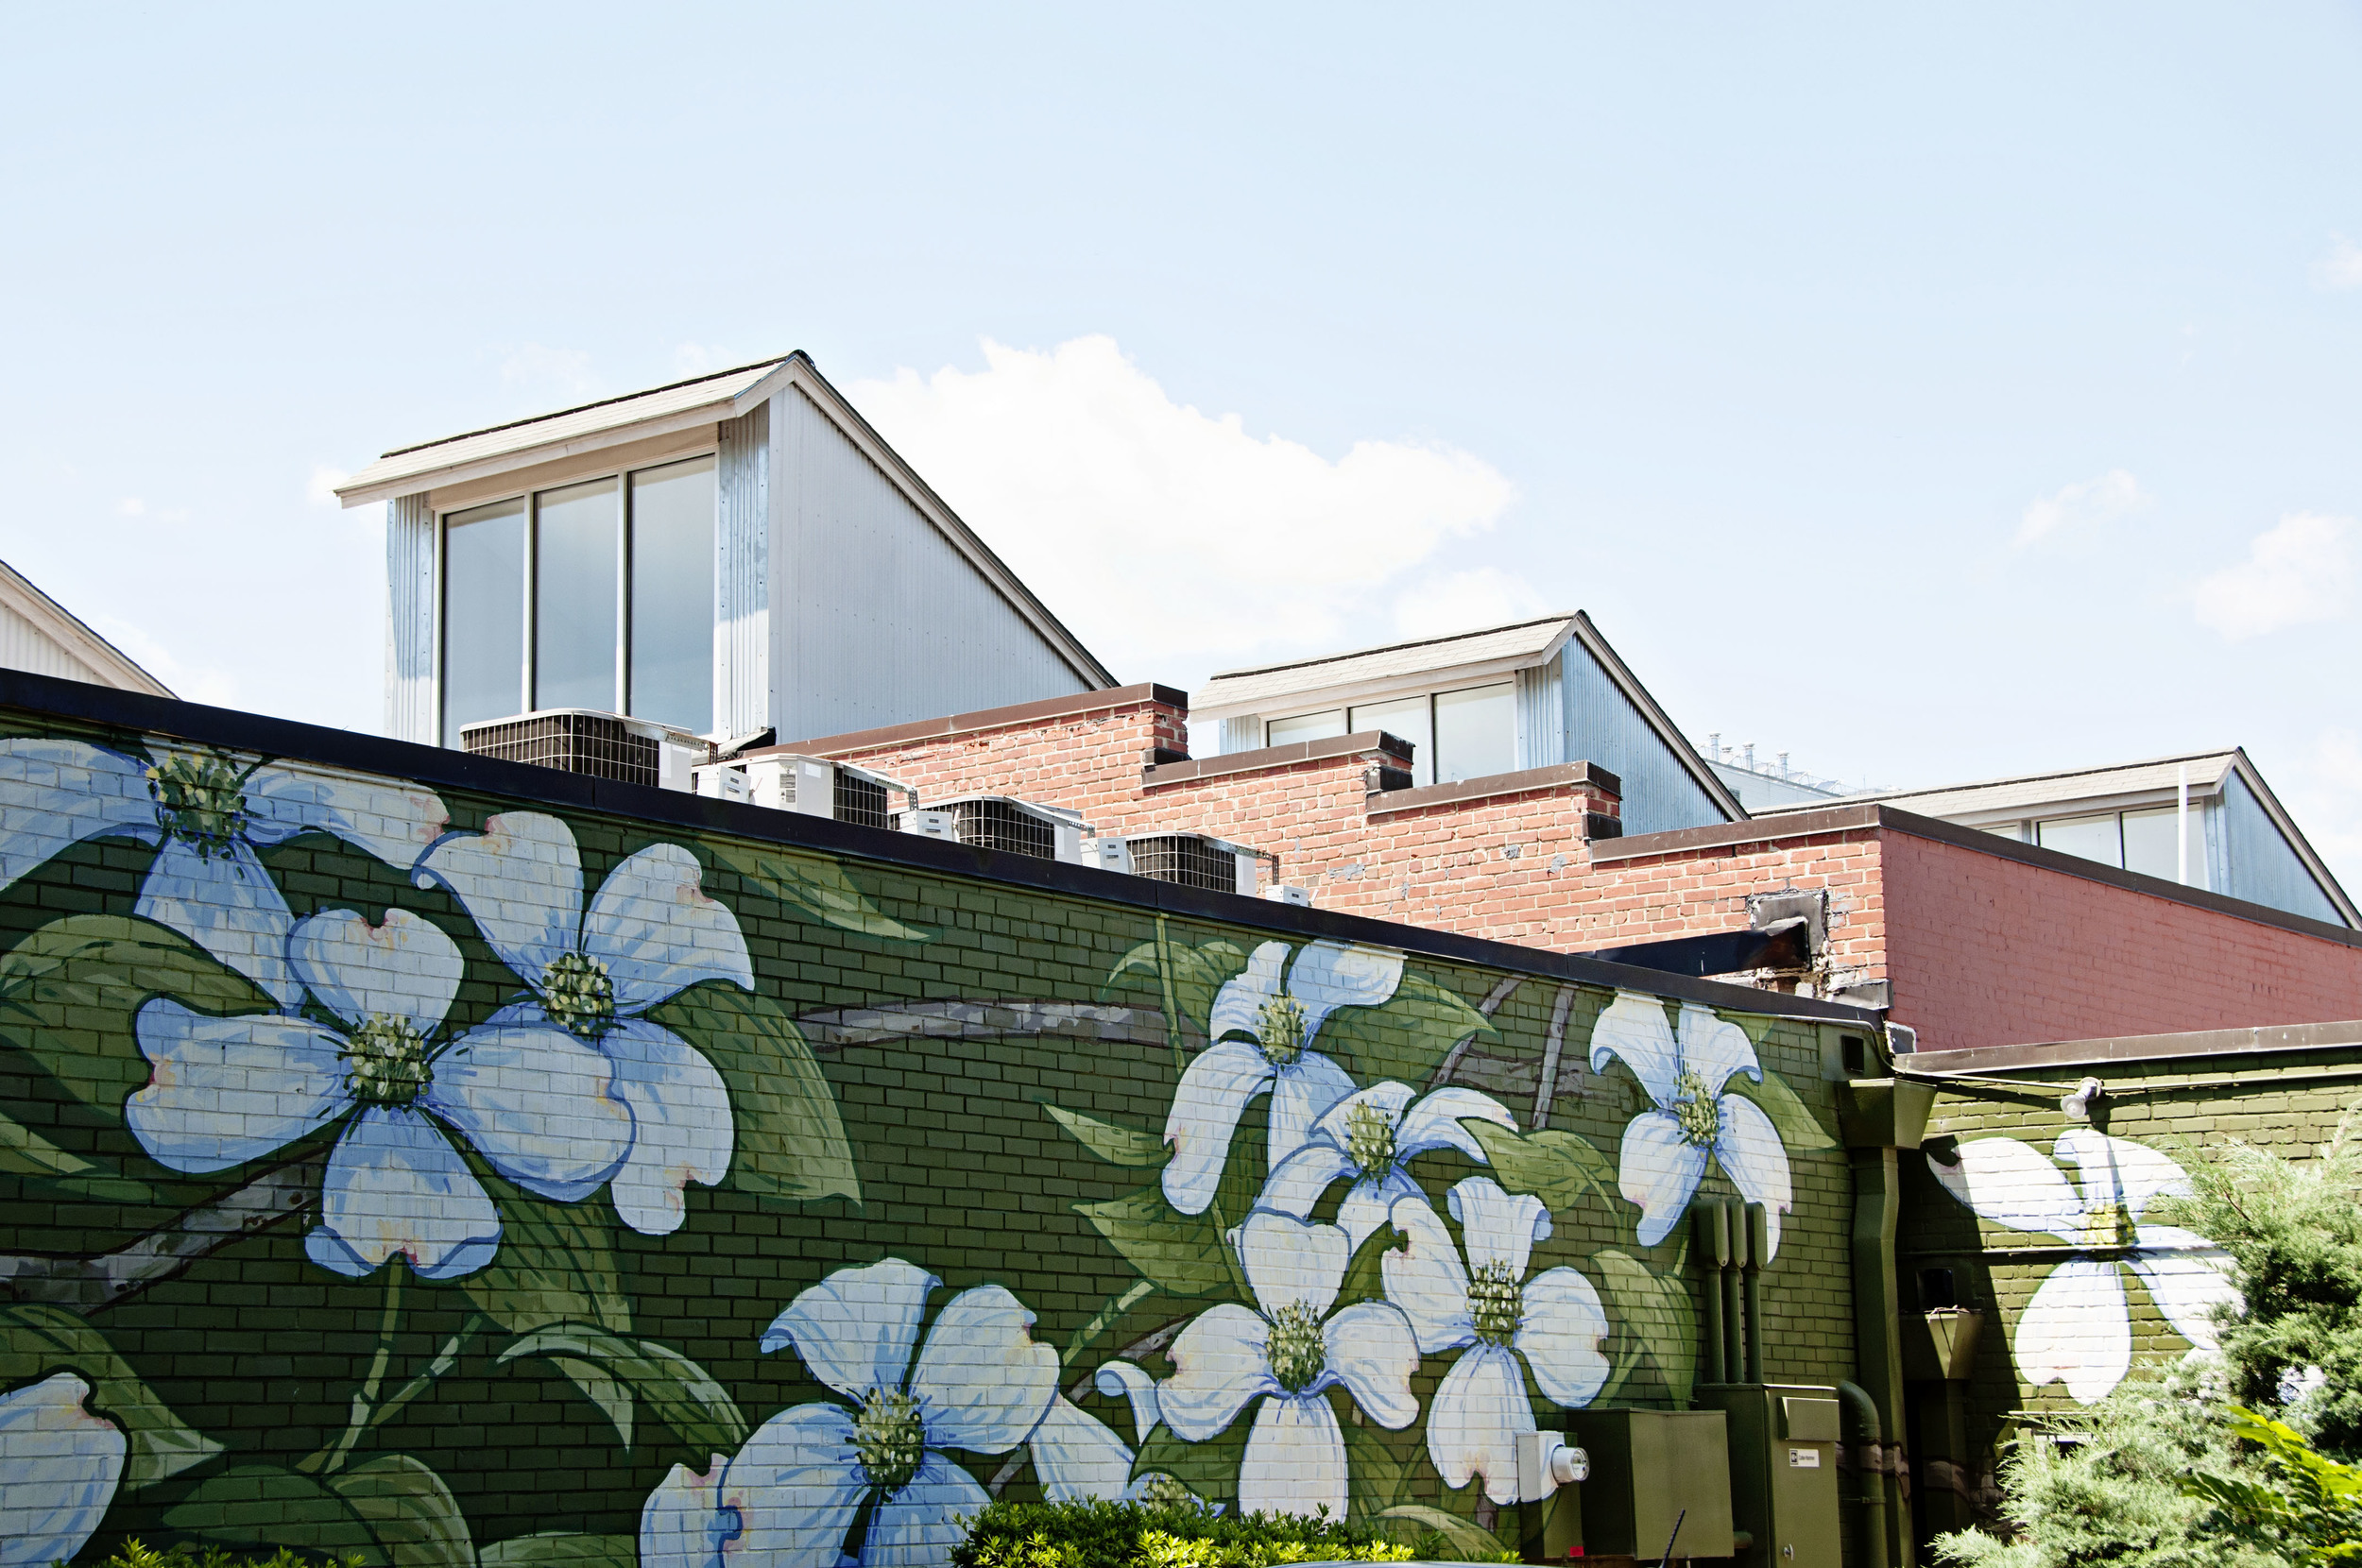 Michael Brown mural - dogwoods (2009-2011) Franklin Street, Chapel Hill, NC